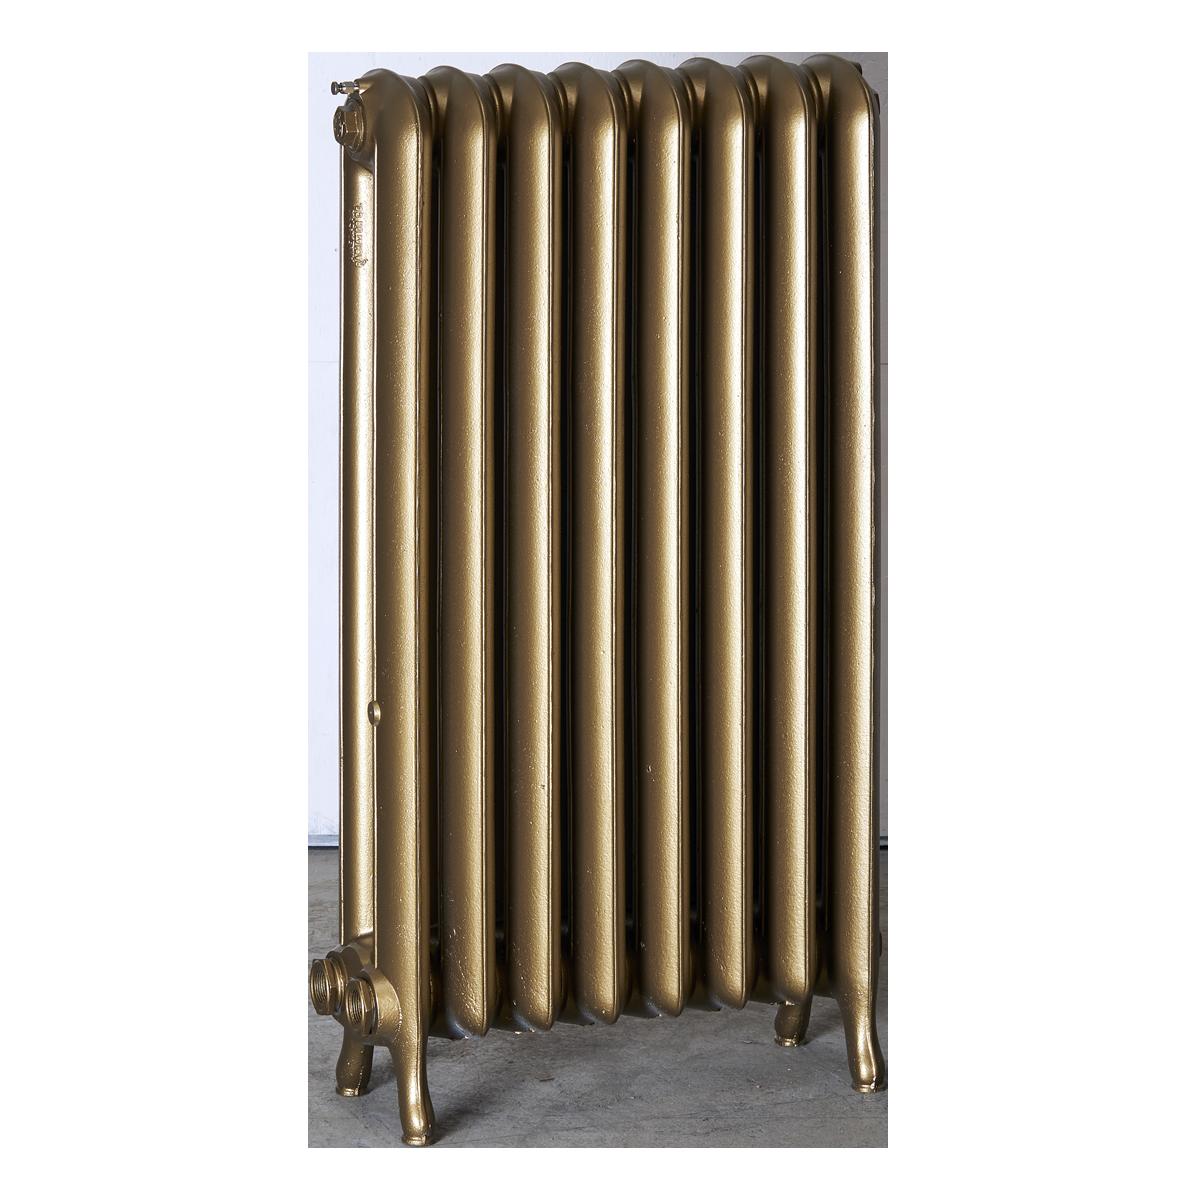 Ironworks Radiators Inc. refurbished cast iron radiator Avalon in Brass metallic